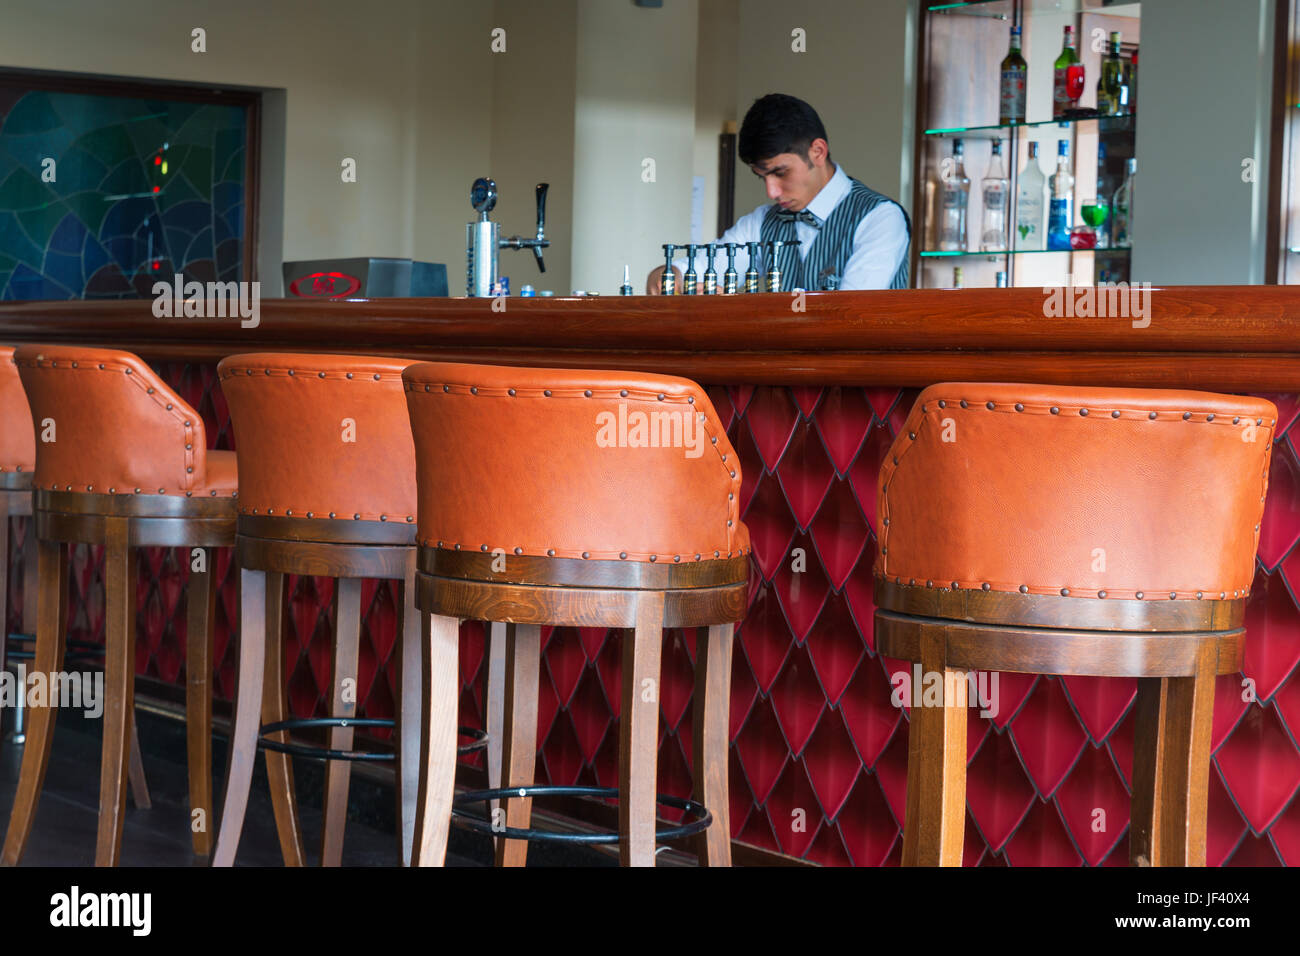 Arabic barman behind counter, preparing something to drink. - Stock Image